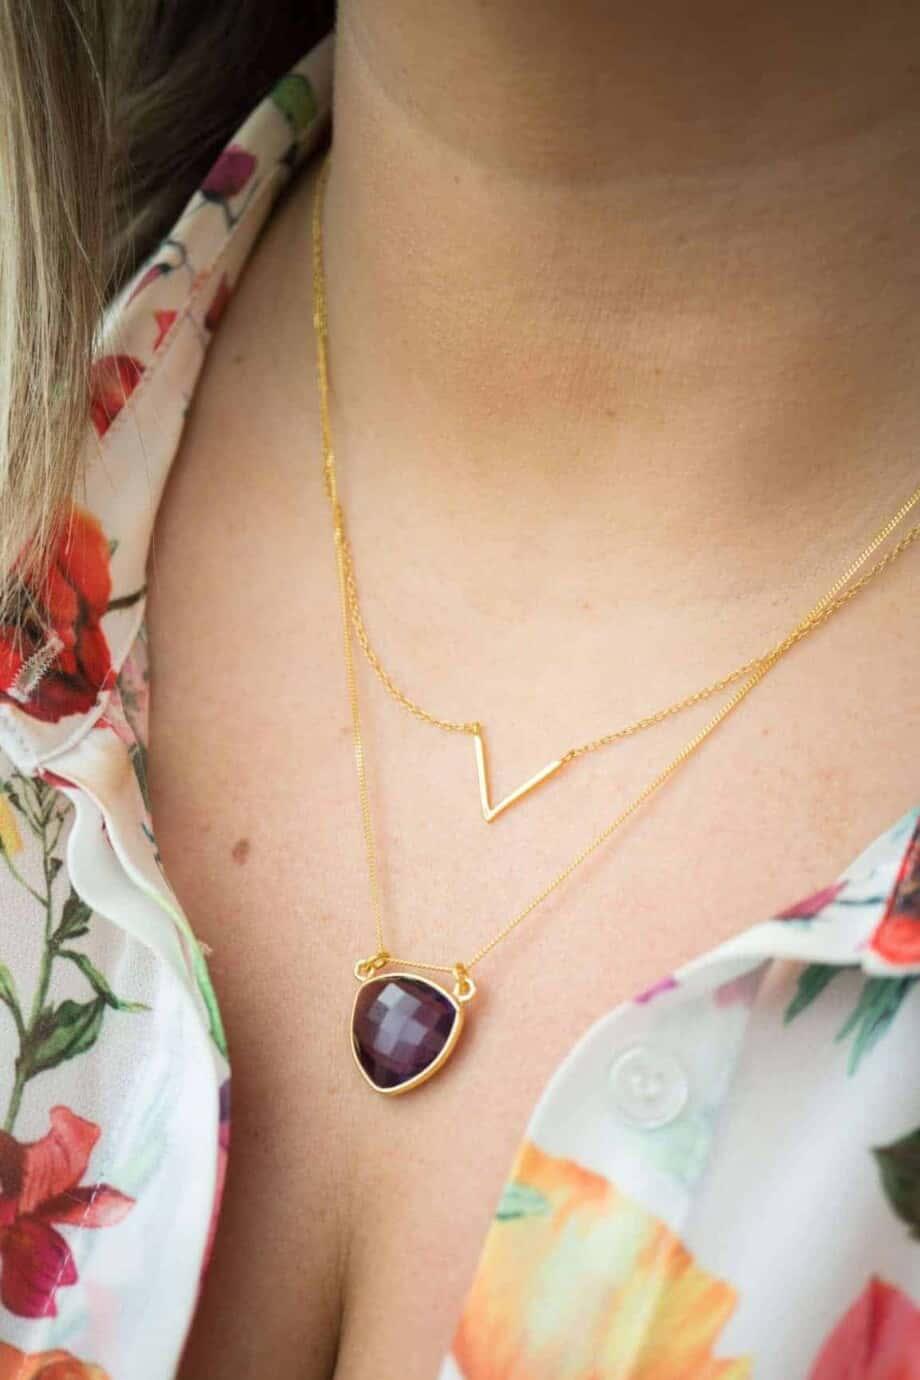 Handgemaakte Gouden ketting met paarse edelsteen 'Amethist'